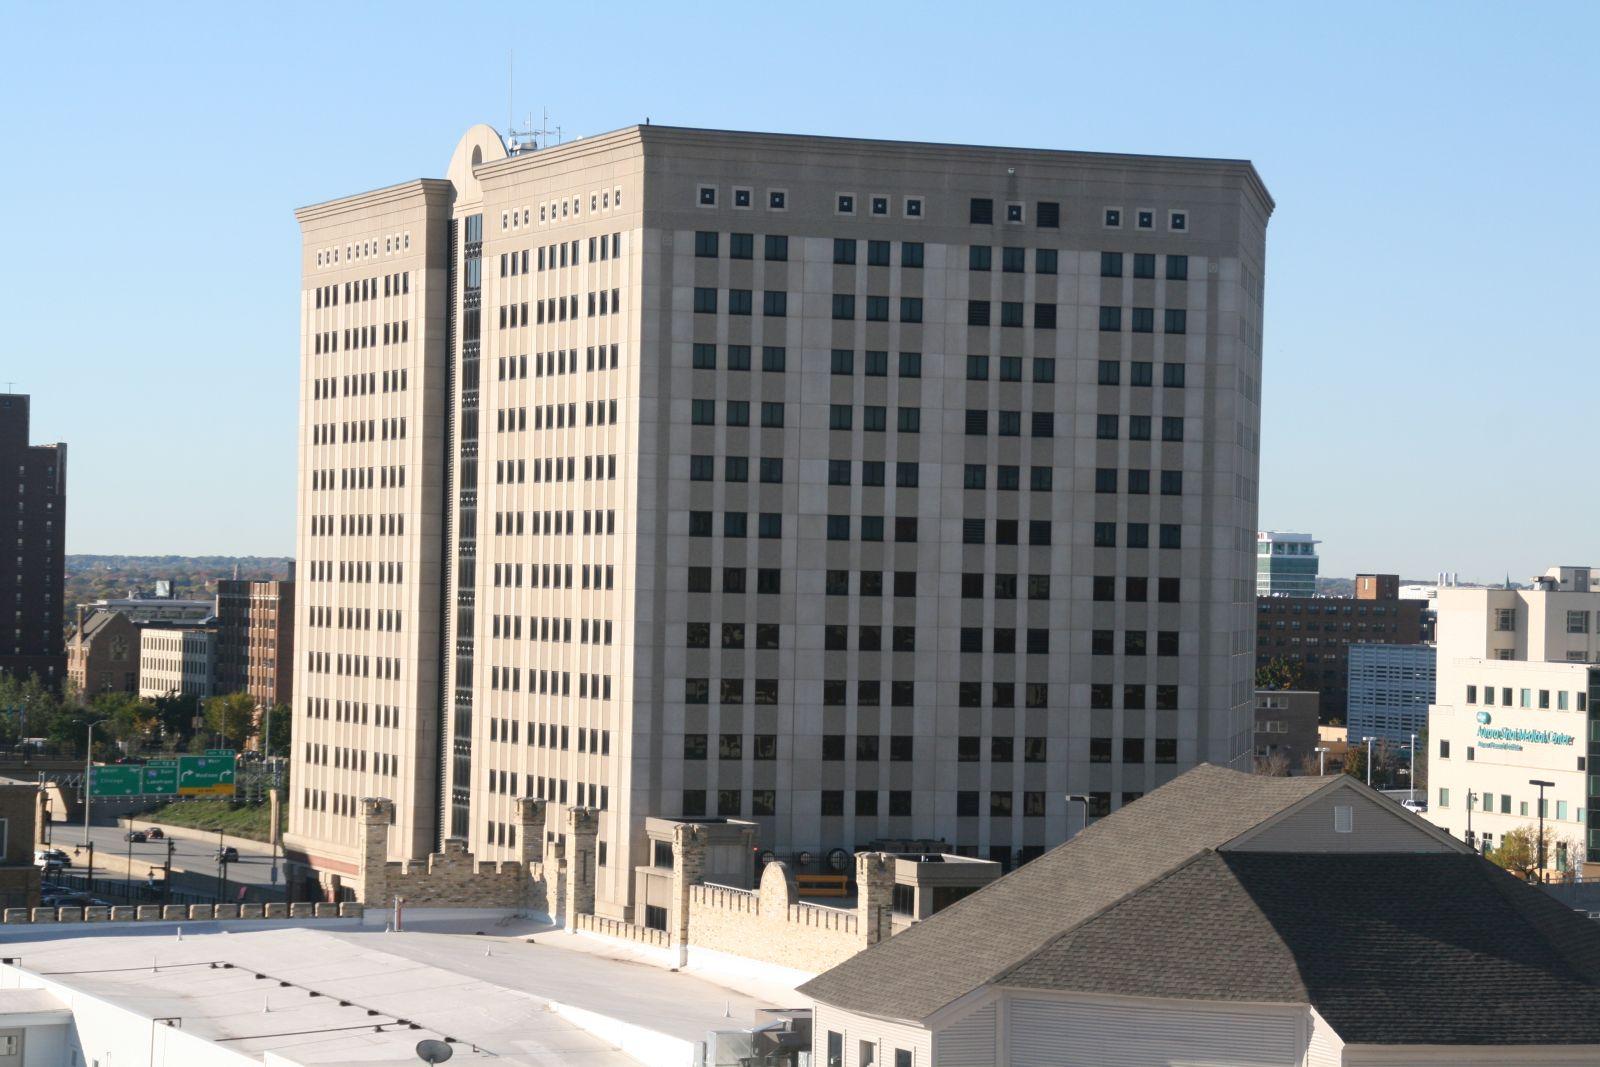 Milwaukee Secure Detention Facility. Photo by Jeramey Jannene.